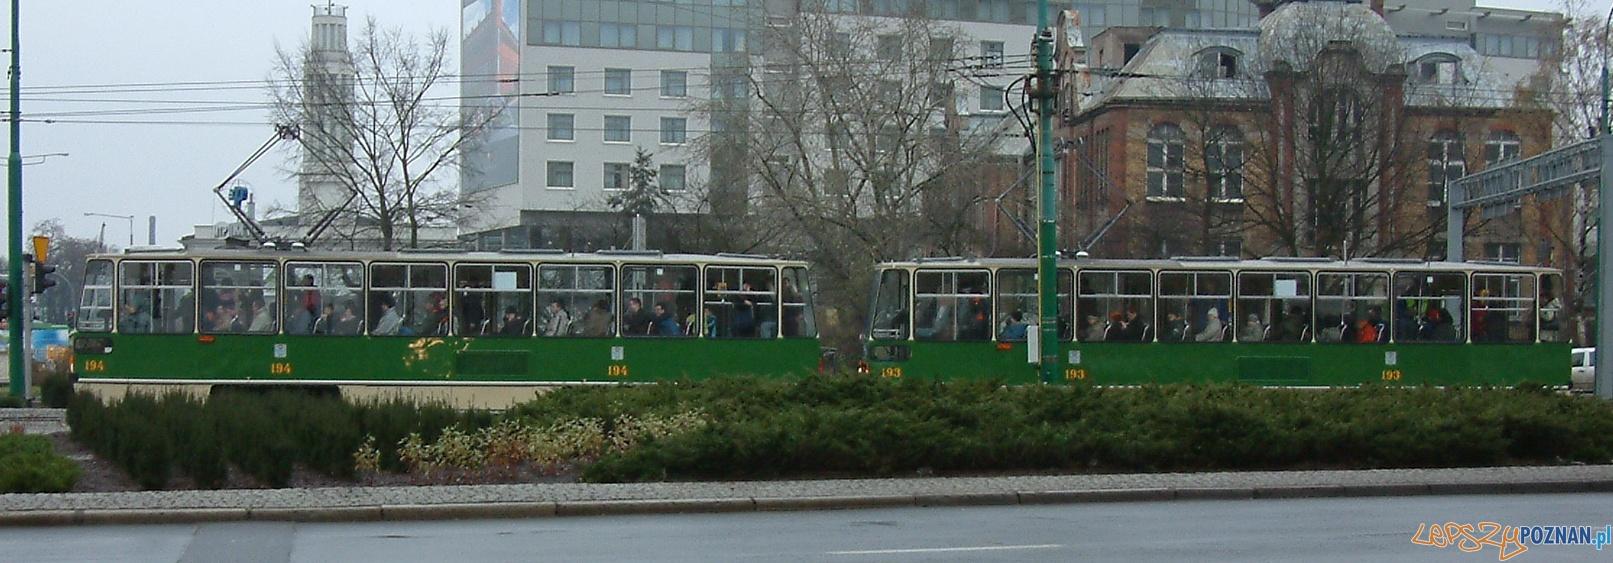 Konstal_105N_Poznań_RB5